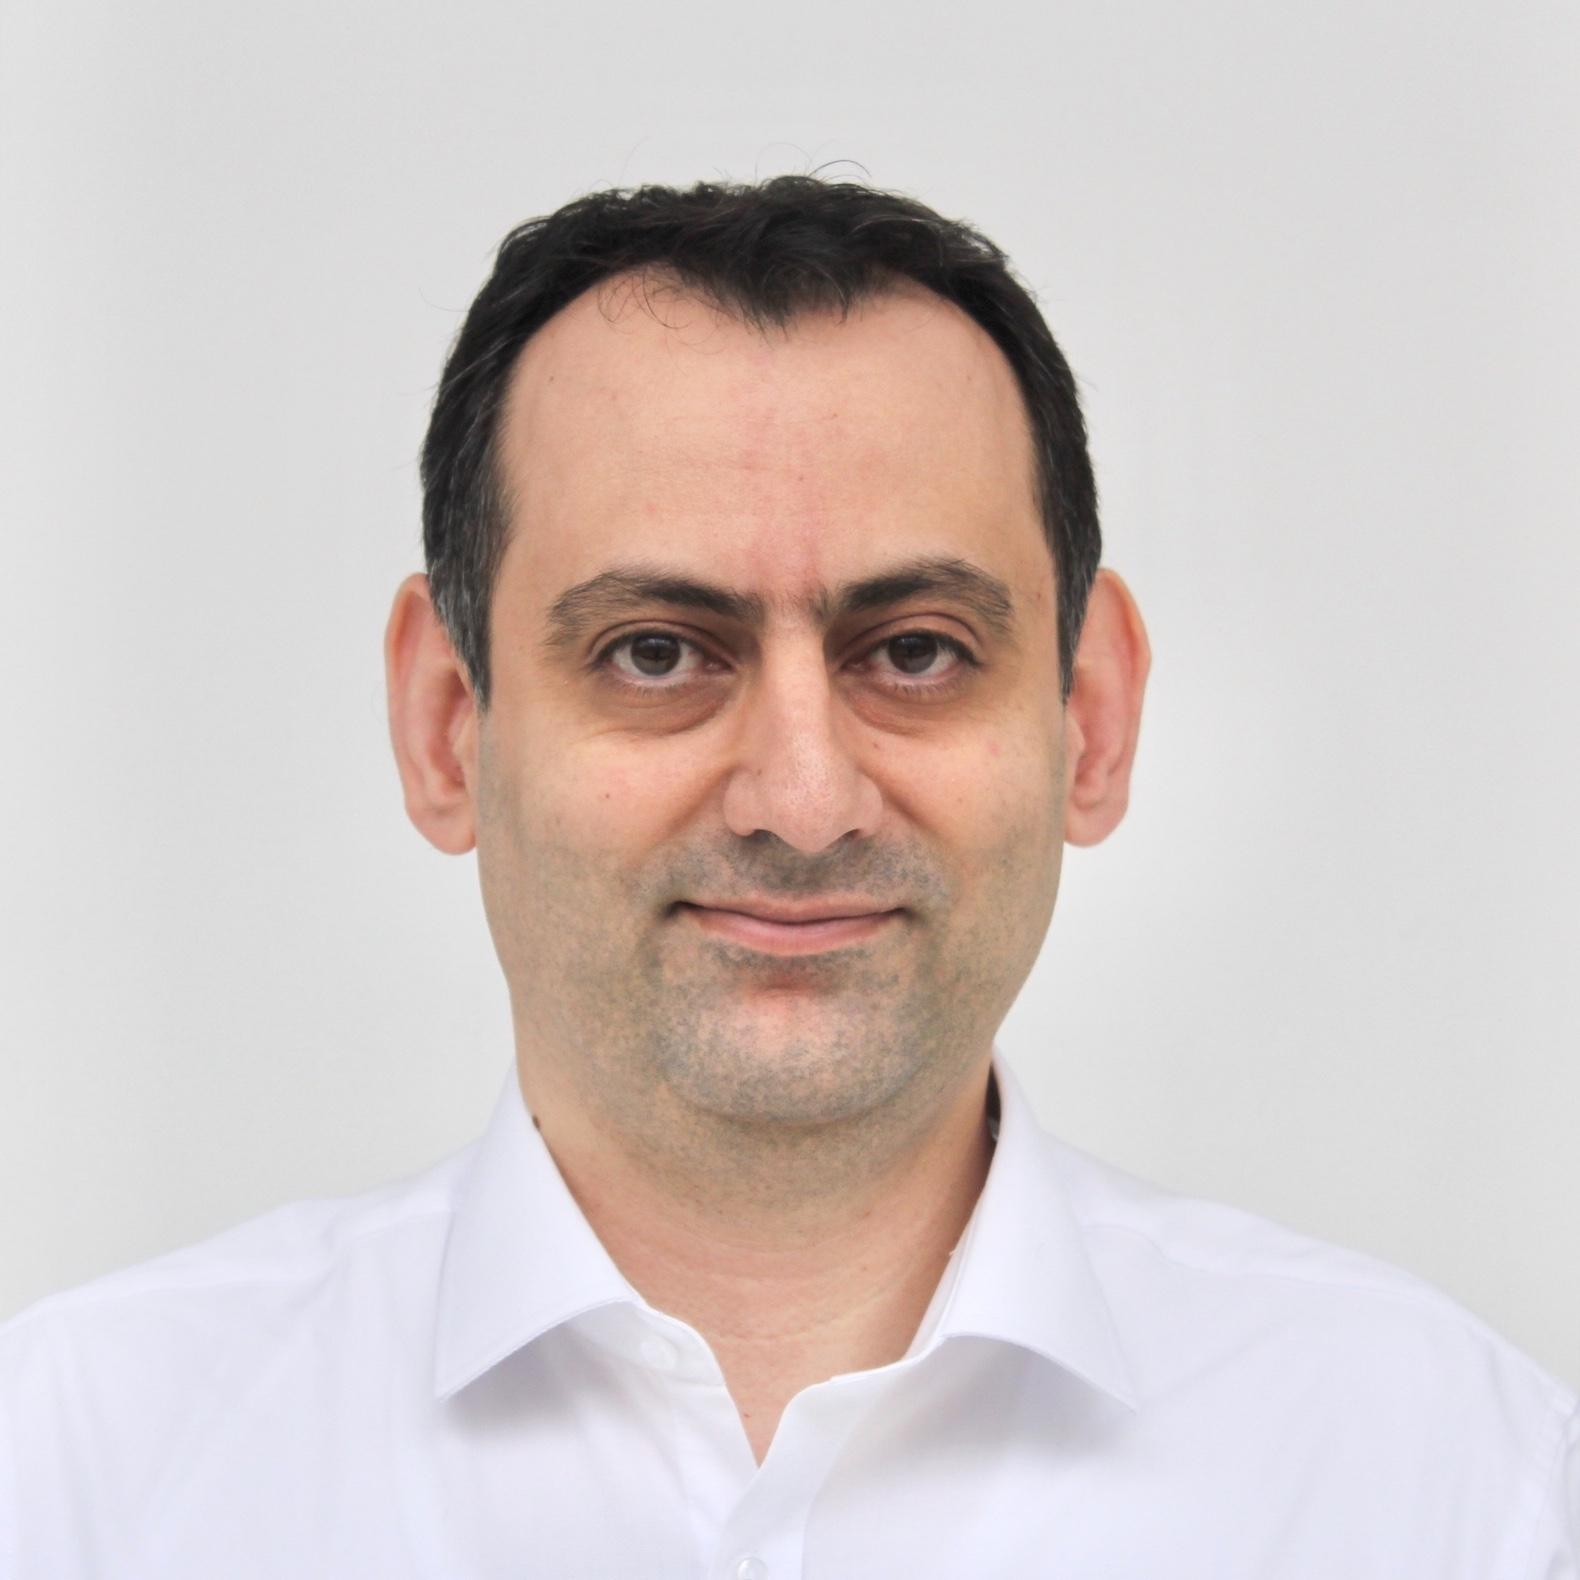 Asaad Faramarzi